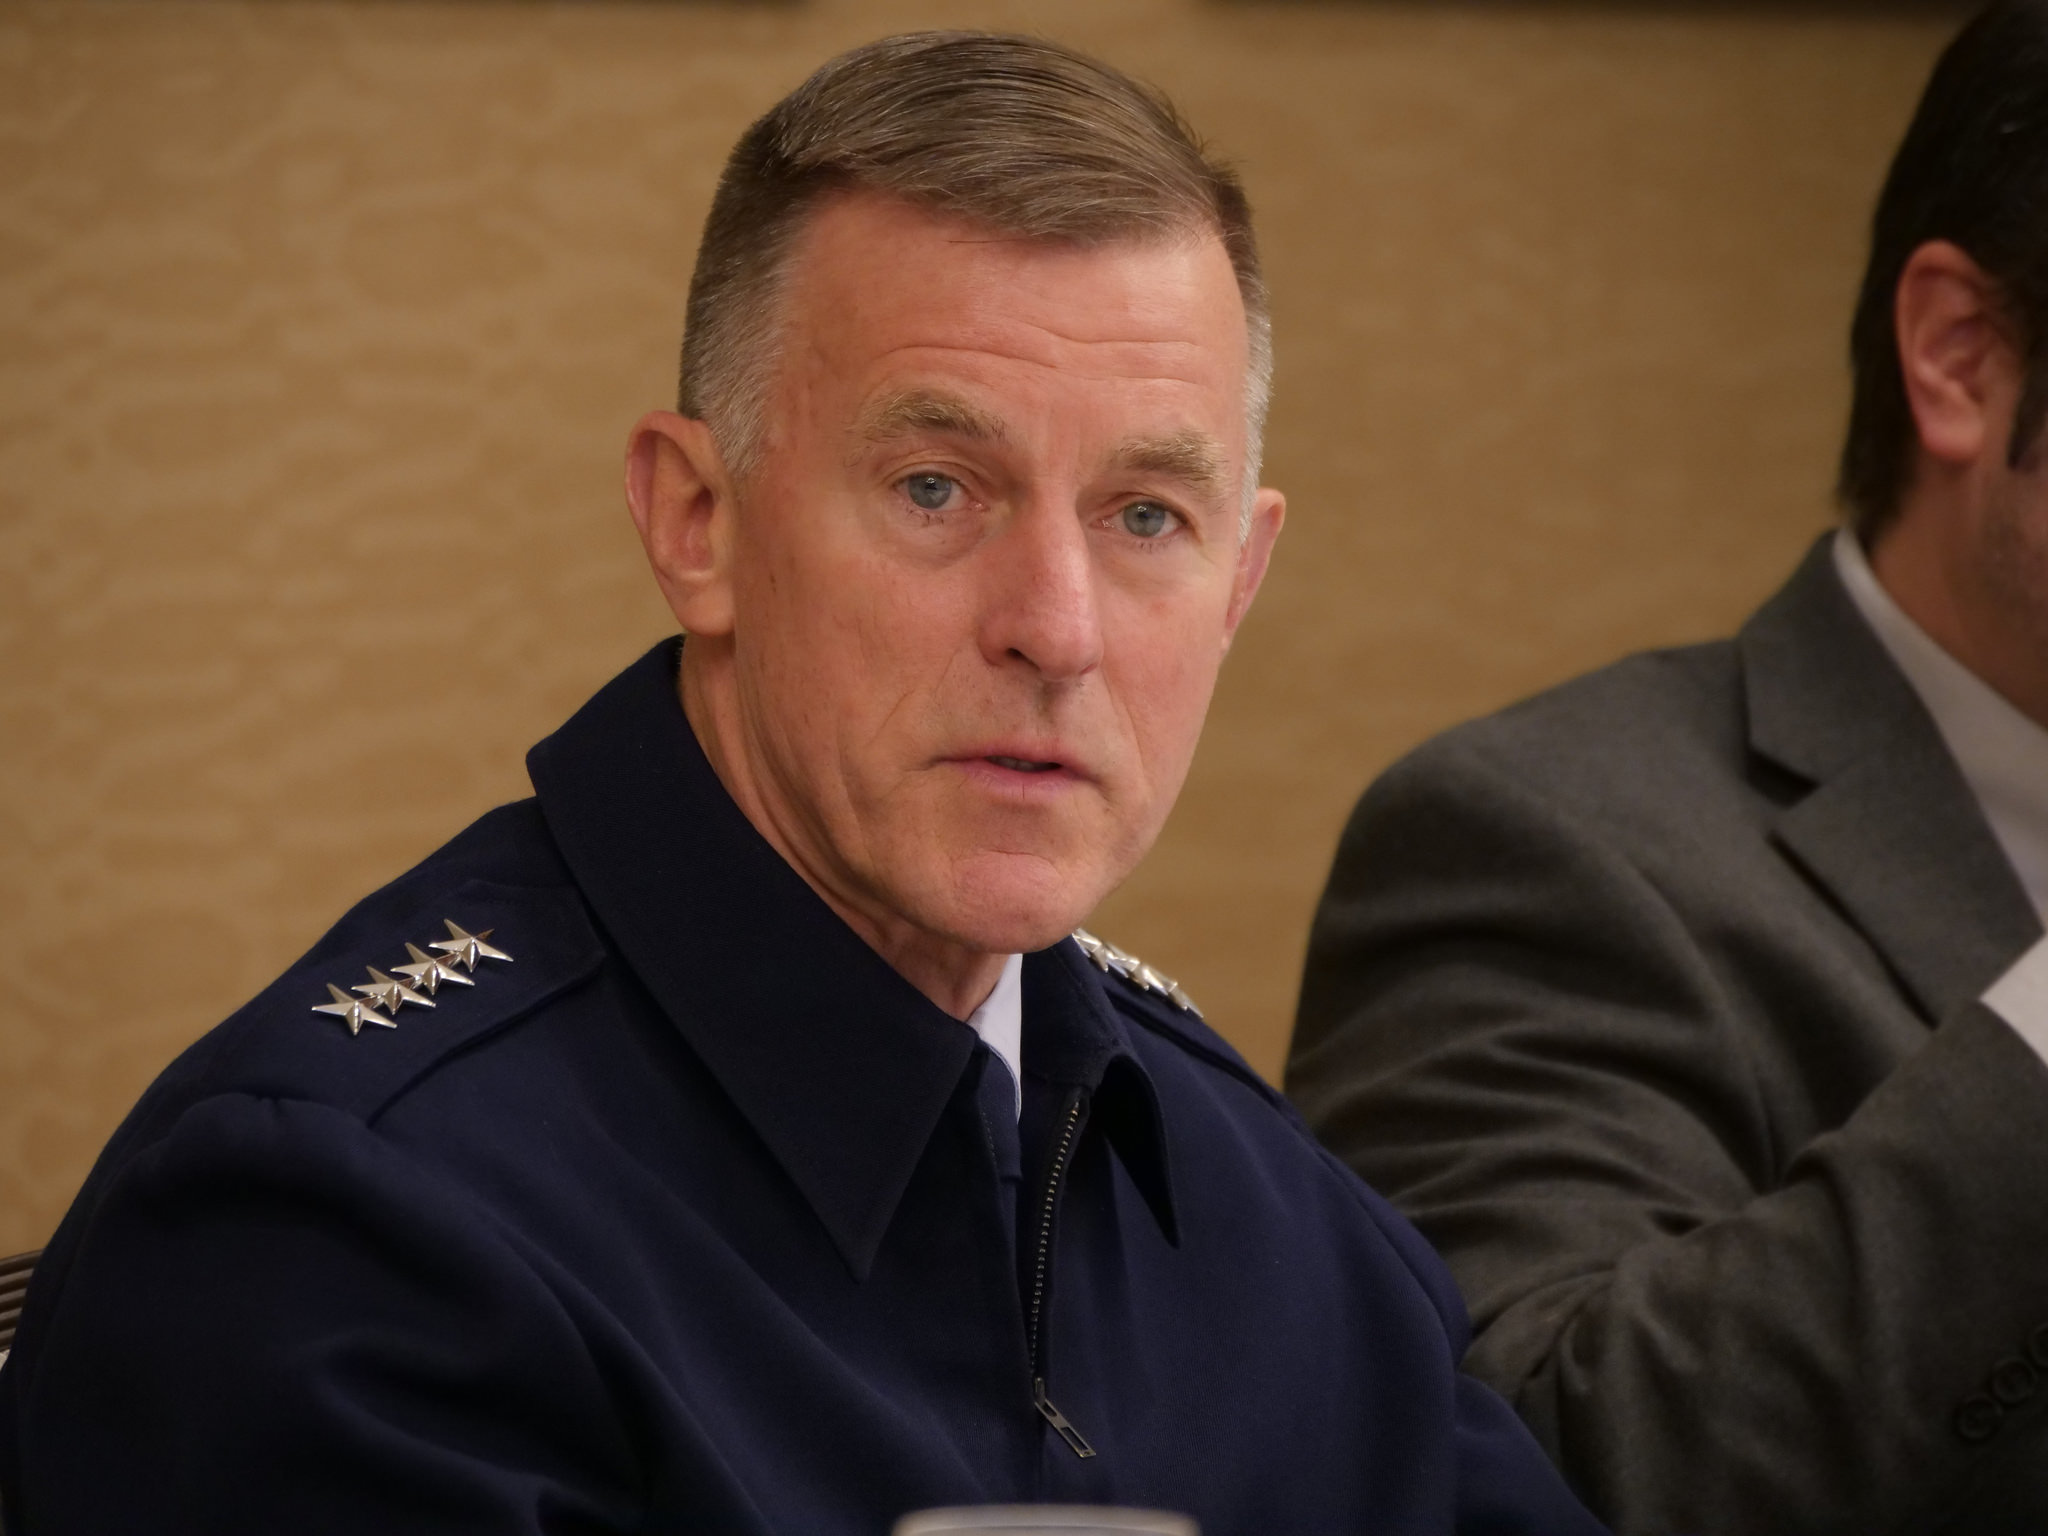 Admiral Paul F. Zukunft